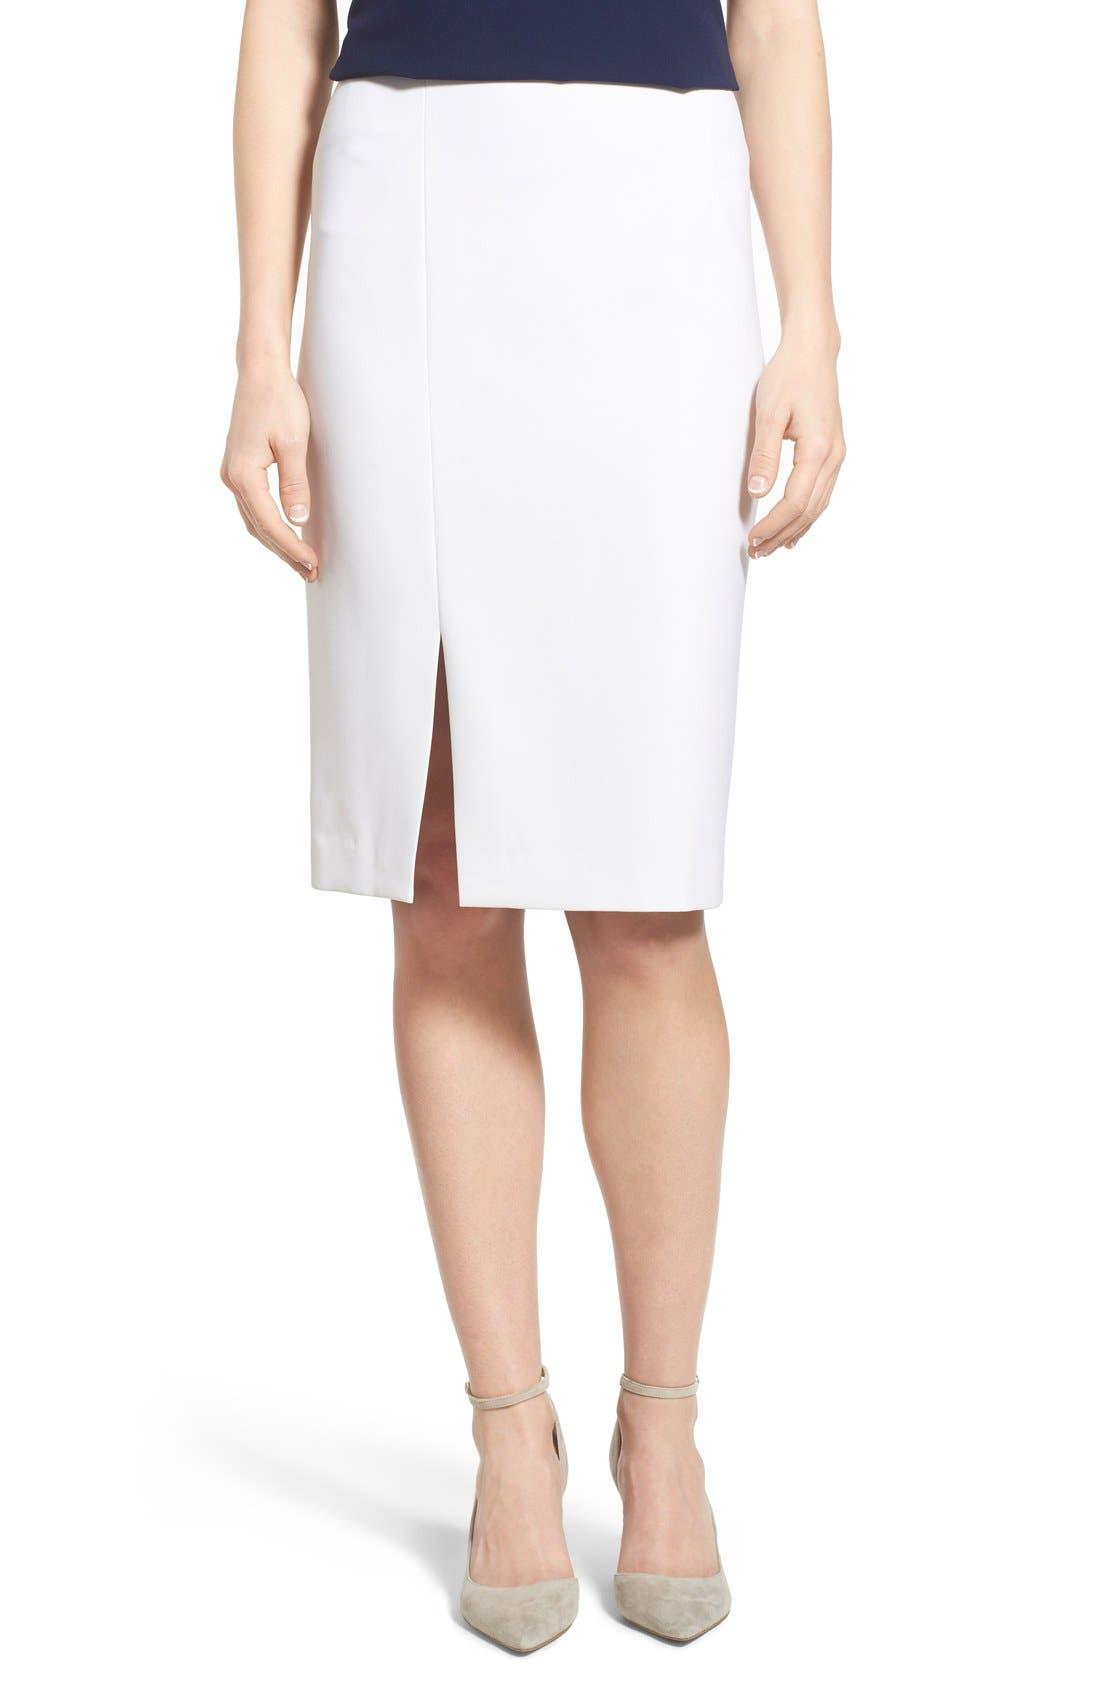 Alternate Image 1 Selected - Ellen Tracy Asymmetrical Front Slit Pencil Skirt